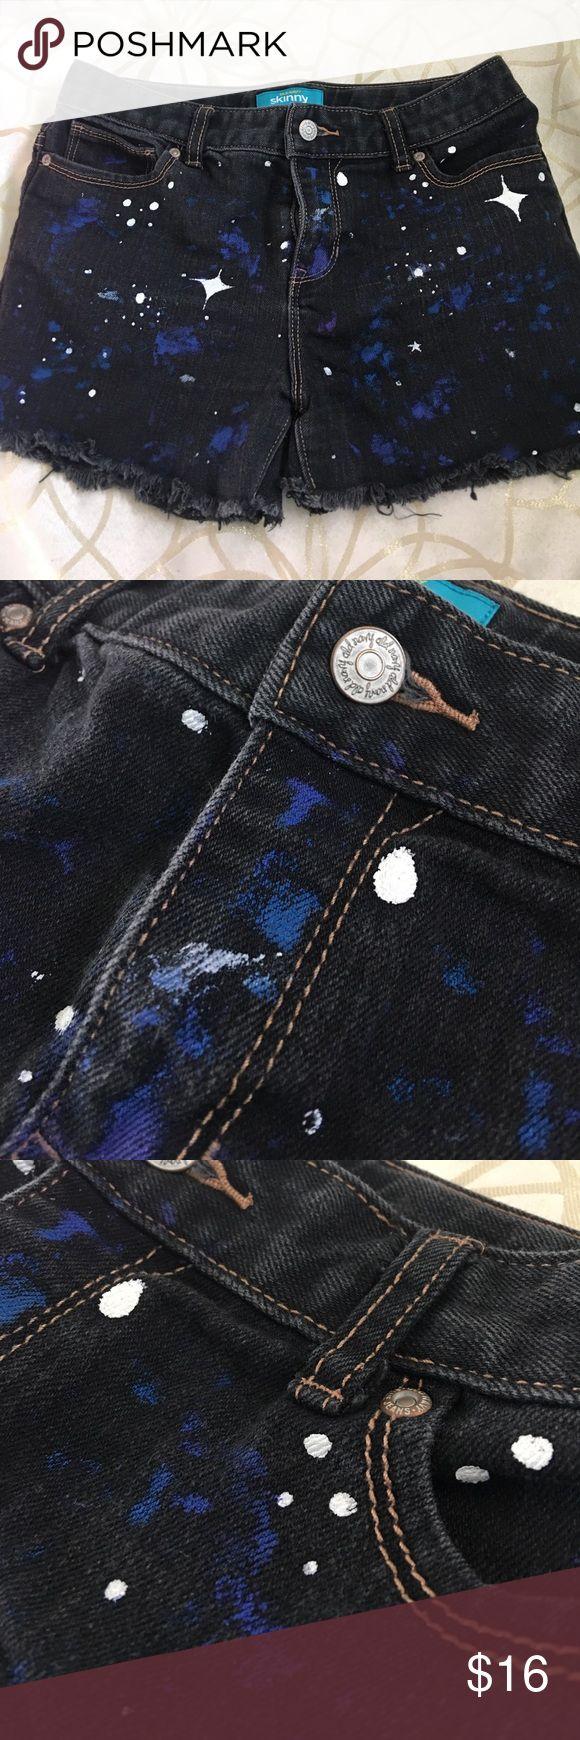 Old Navy custom galaxy shorts Hand painted, distressed galaxy shorts made from old navy skinny jeans Old Navy Bottoms Shorts